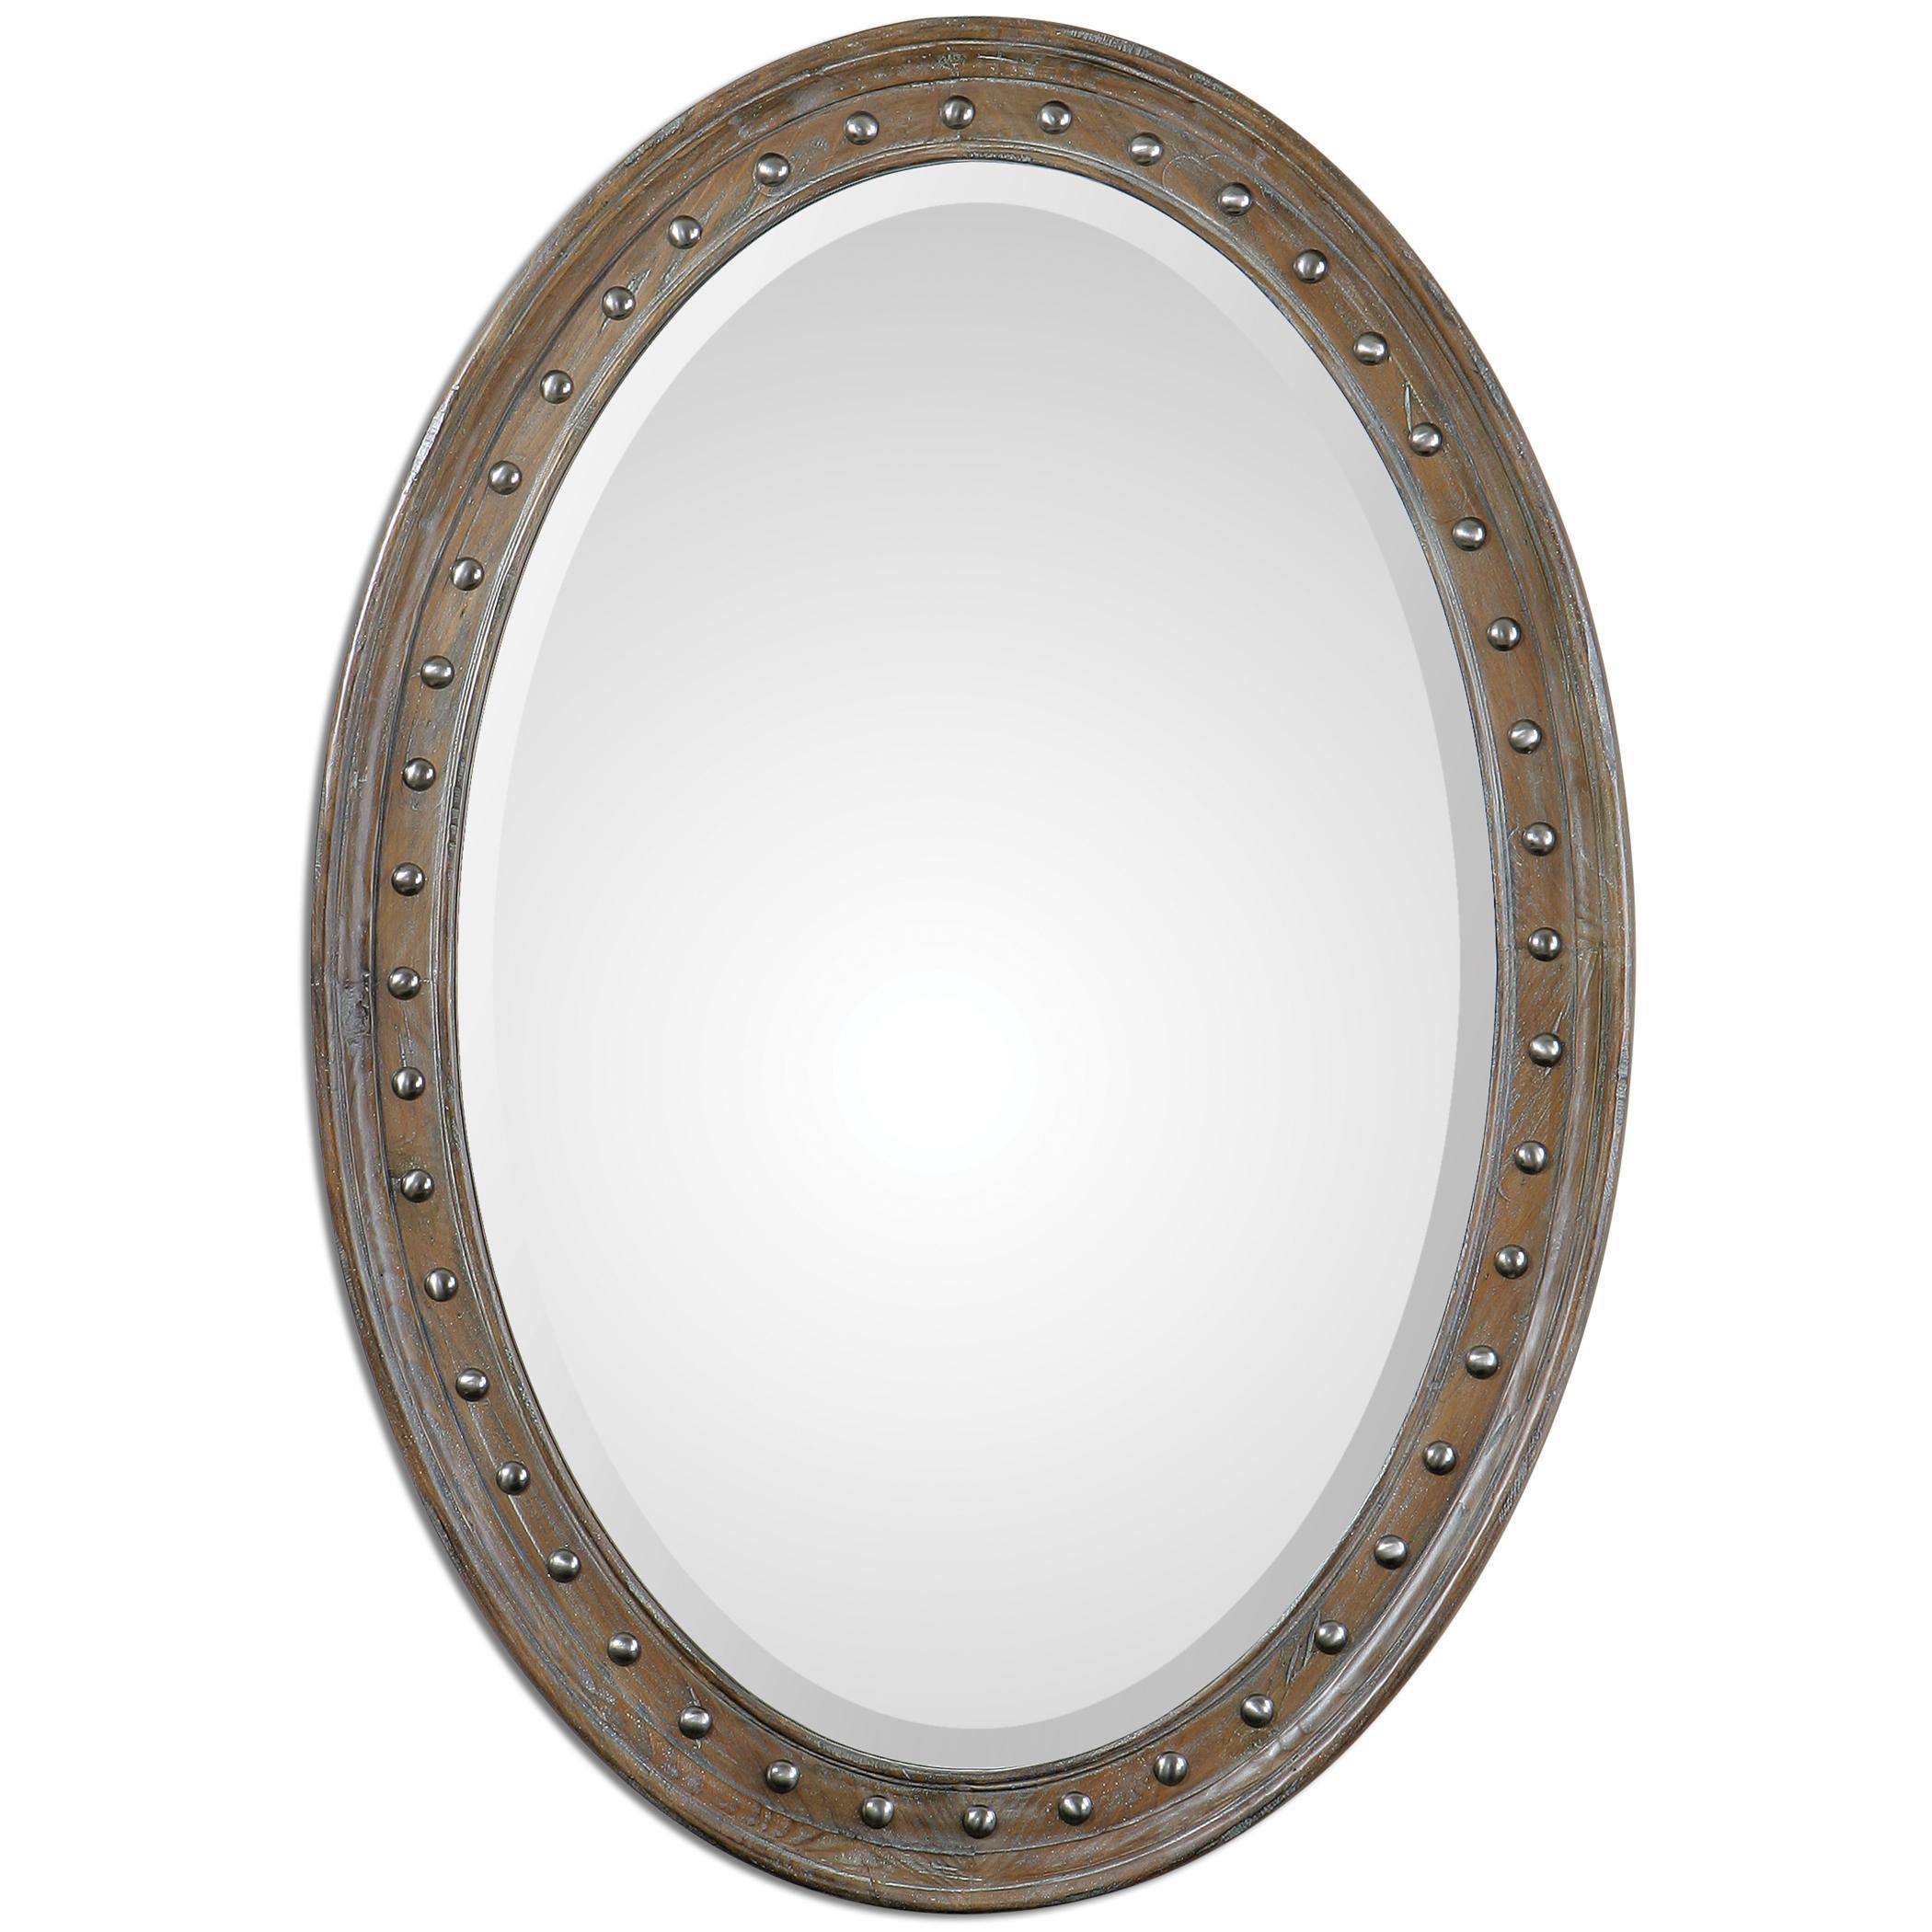 Uttermost Mirrors Sylvana Oval Mirror - Item Number: 11917